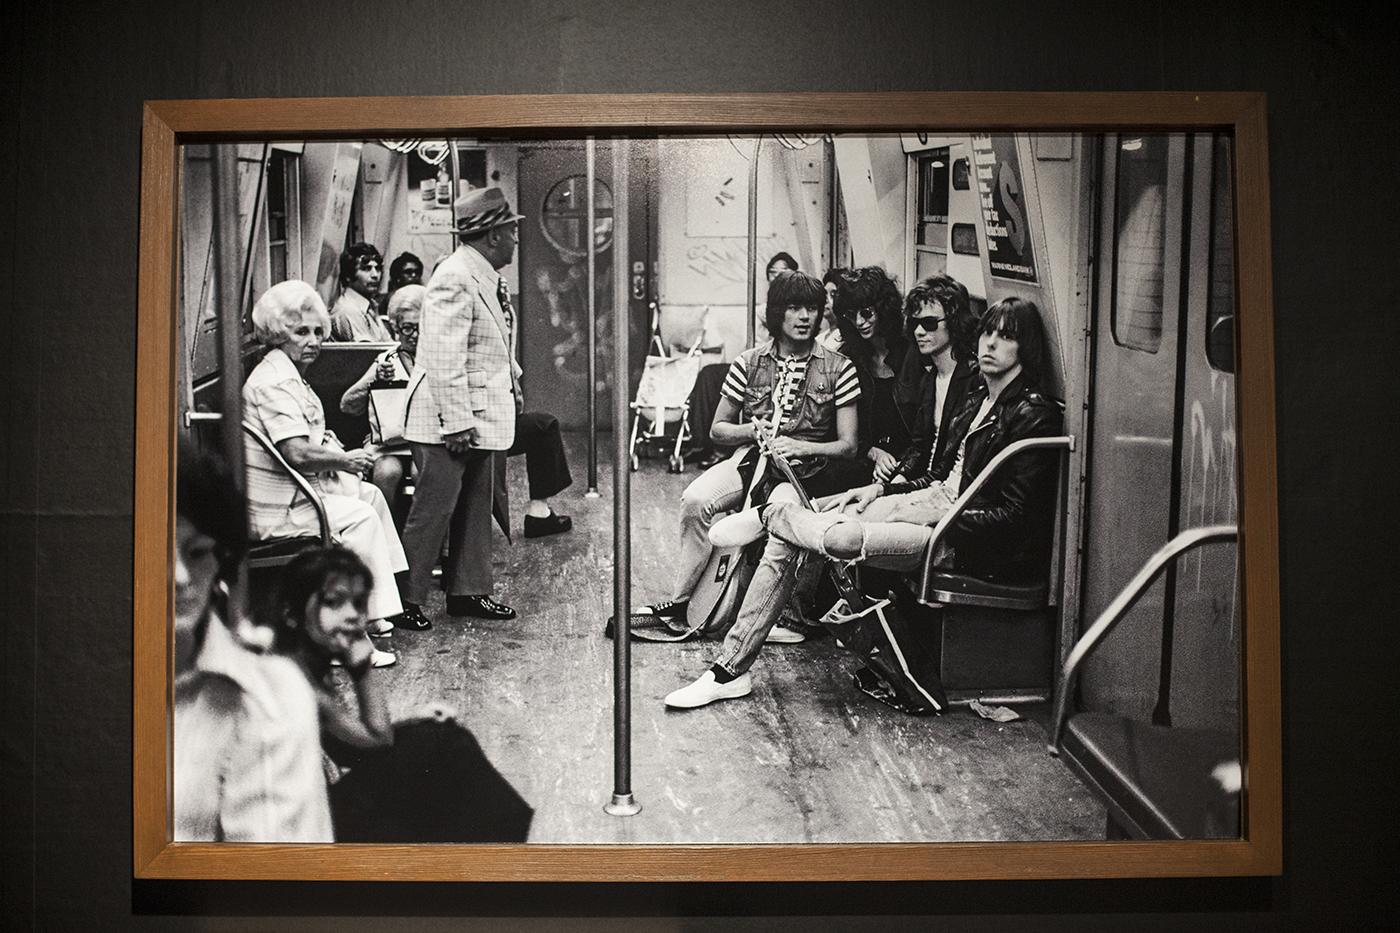 m-0132 【レポート】ロックの歴史が凝縮。フジロックファンも必見のボブ・グルーエン写真展